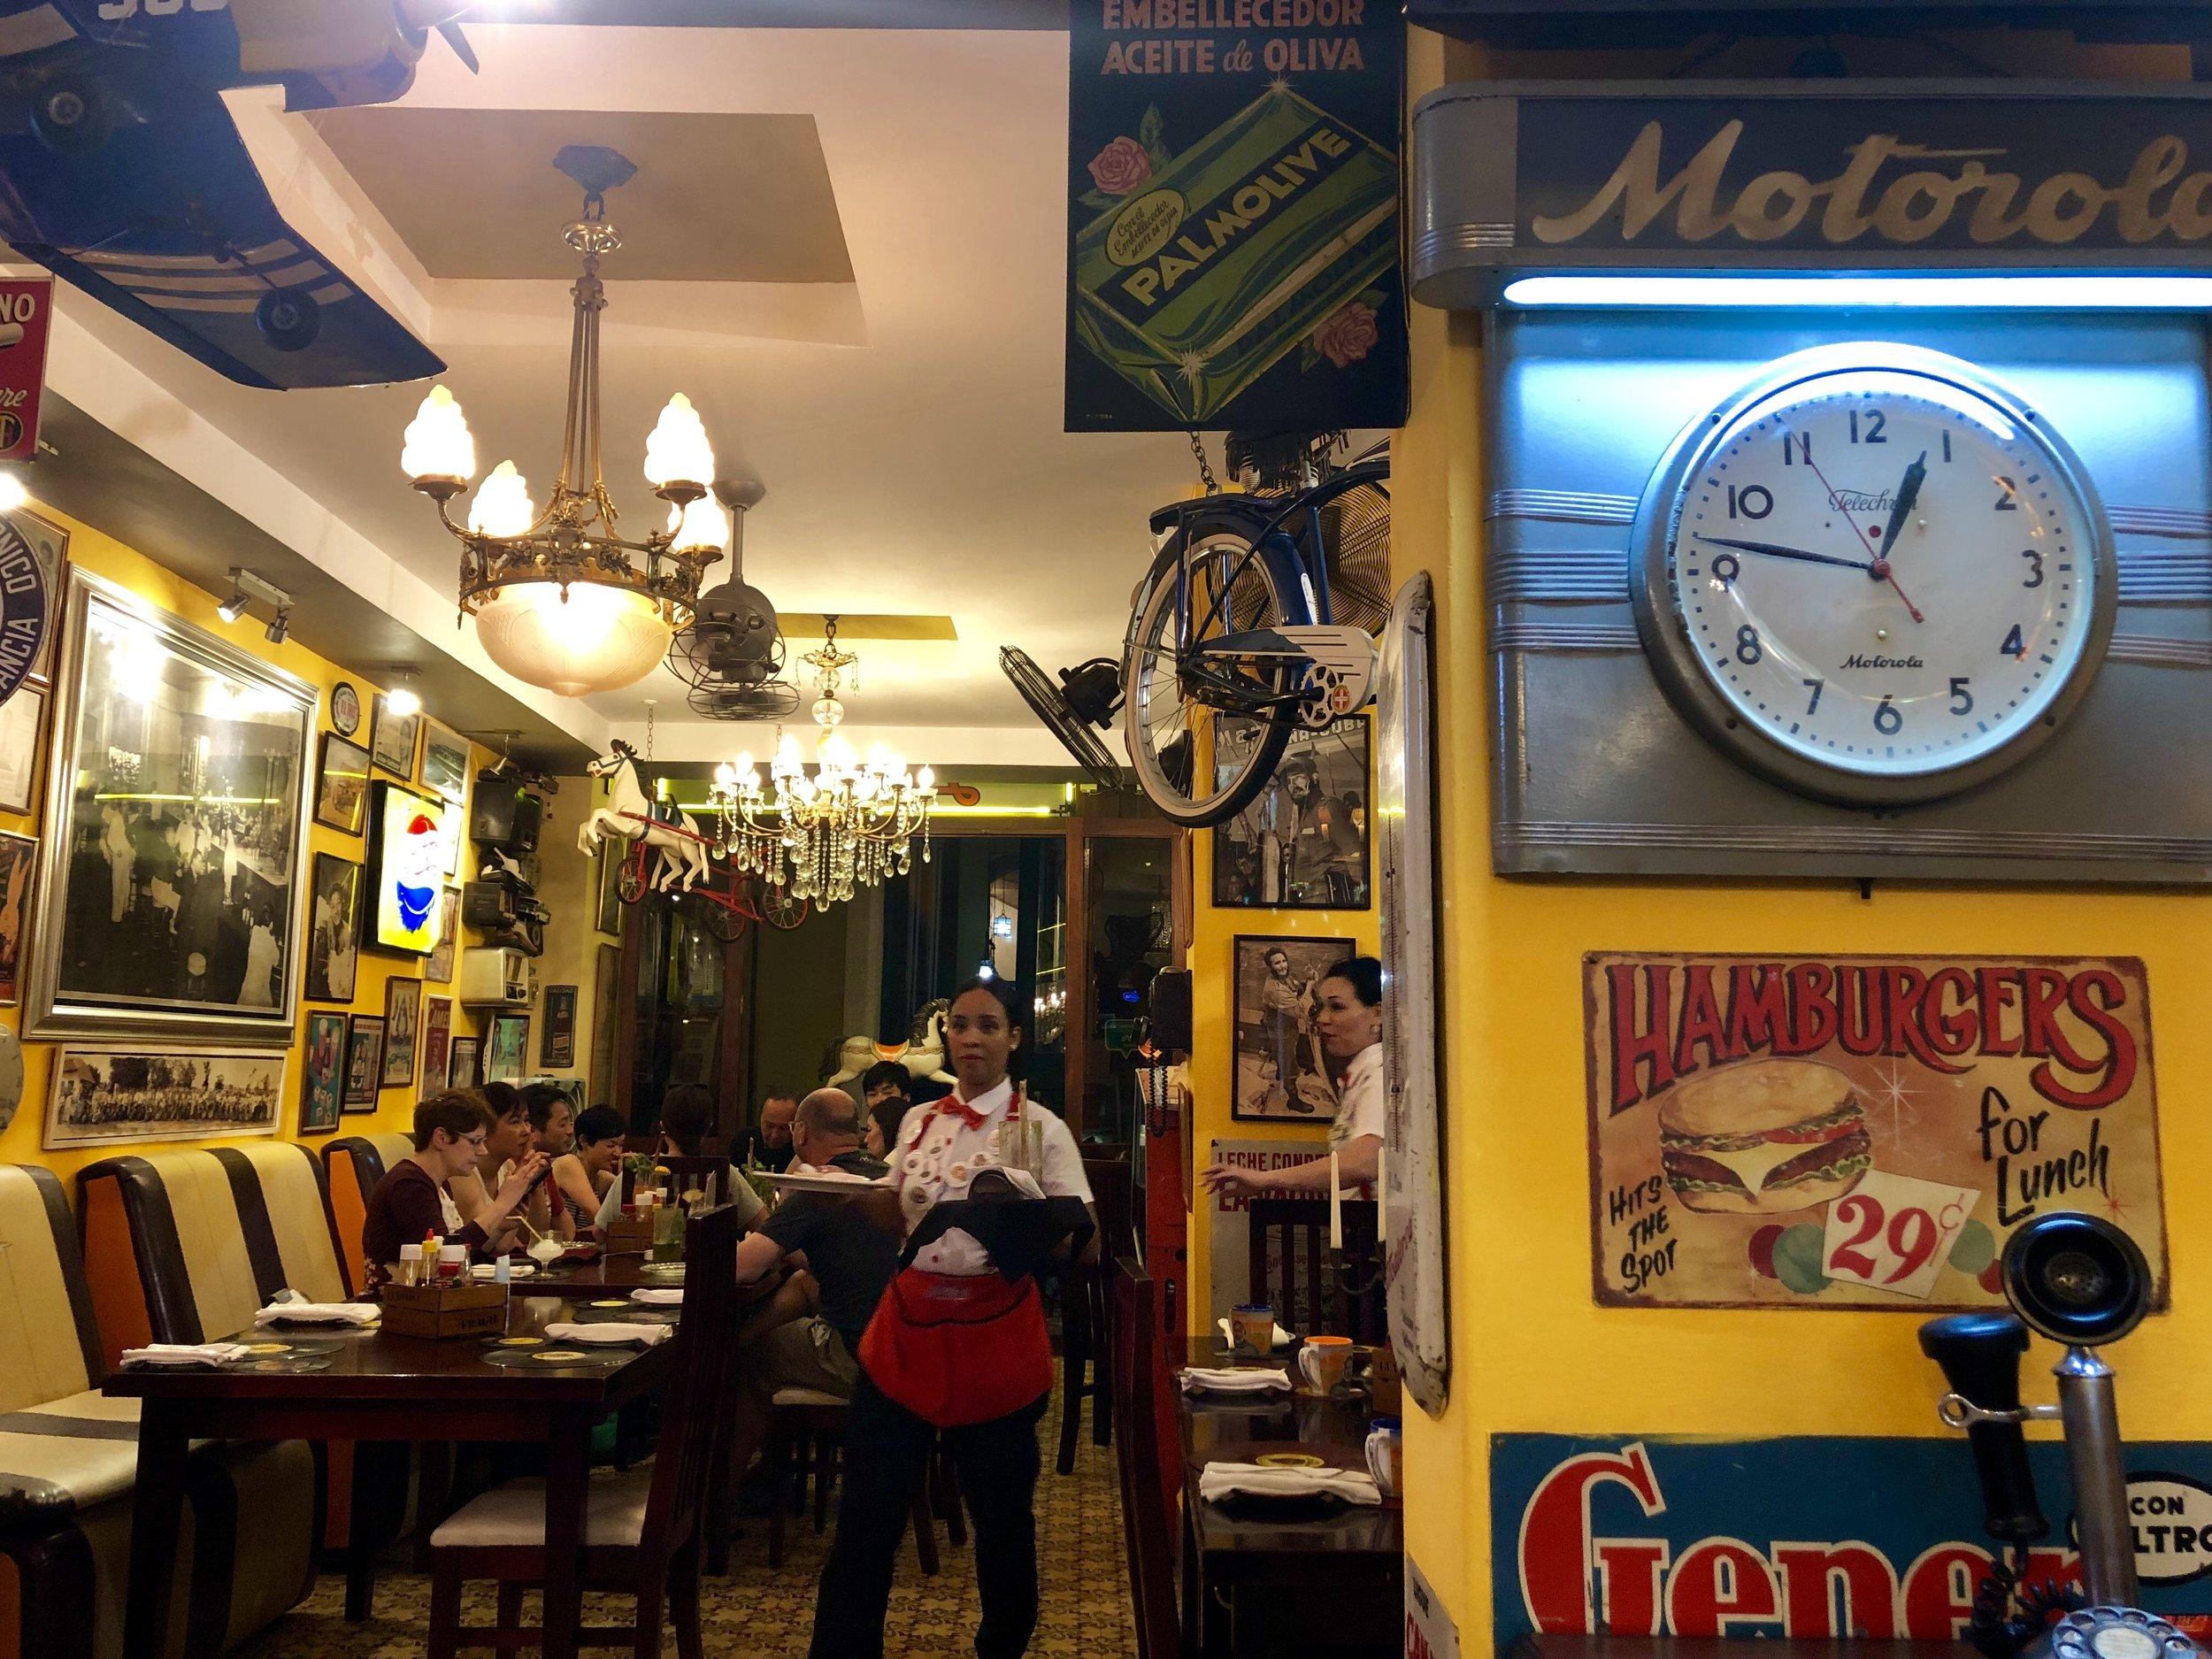 Cuba bars (Vitriola), Kaitlyn Alkass.jpeg